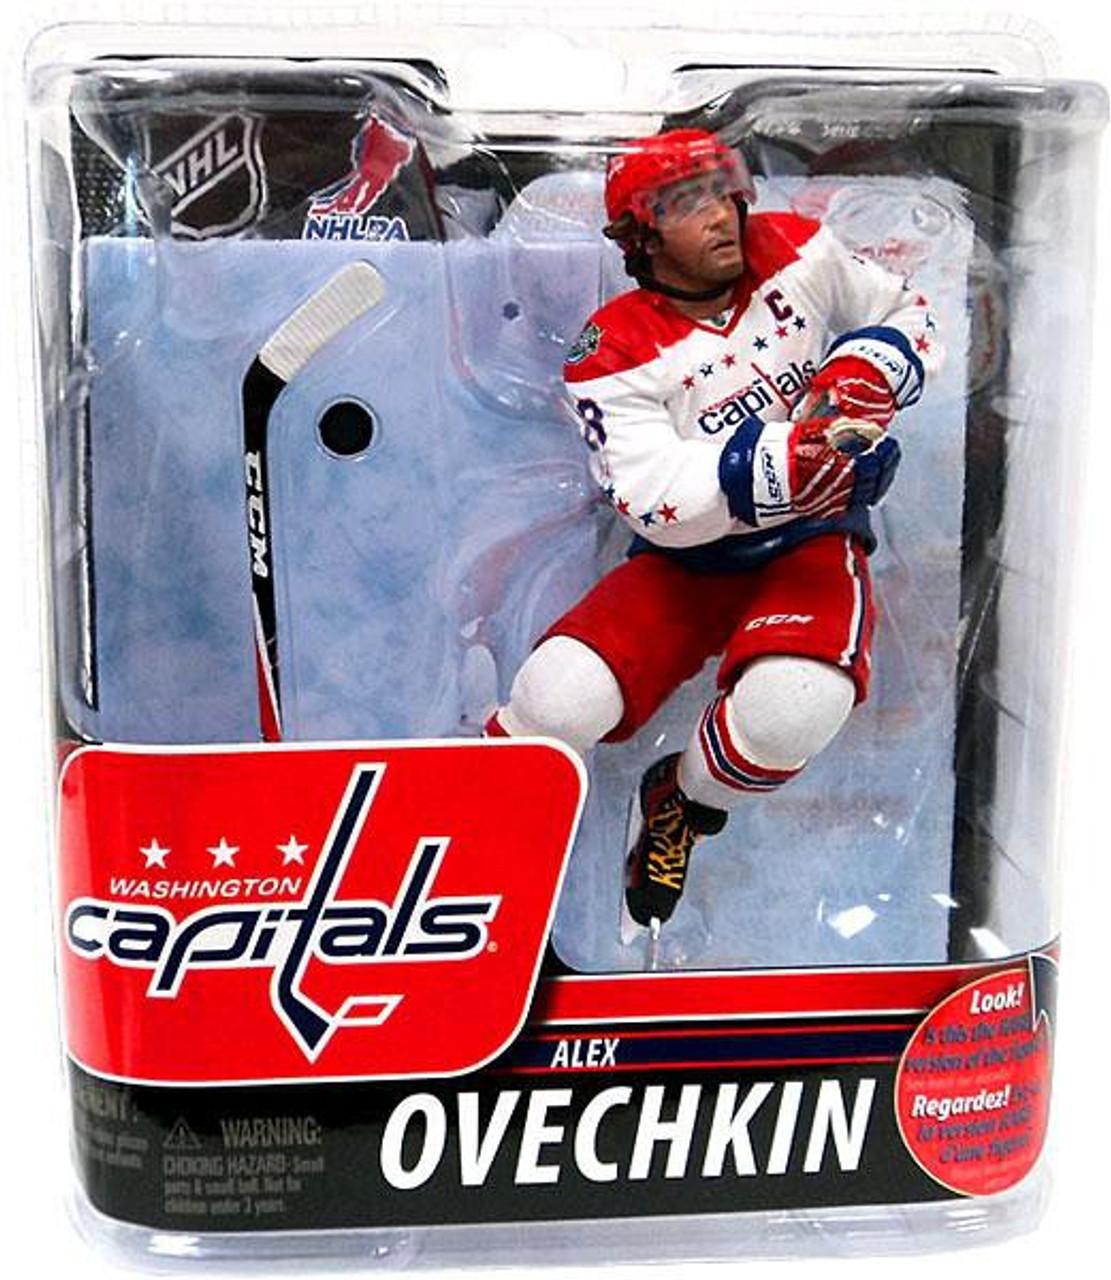 64822a68b3c McFarlane Toys NHL Washington Capitals Sports Picks Series 29 Alexander  Ovechkin Action Figure - ToyWiz